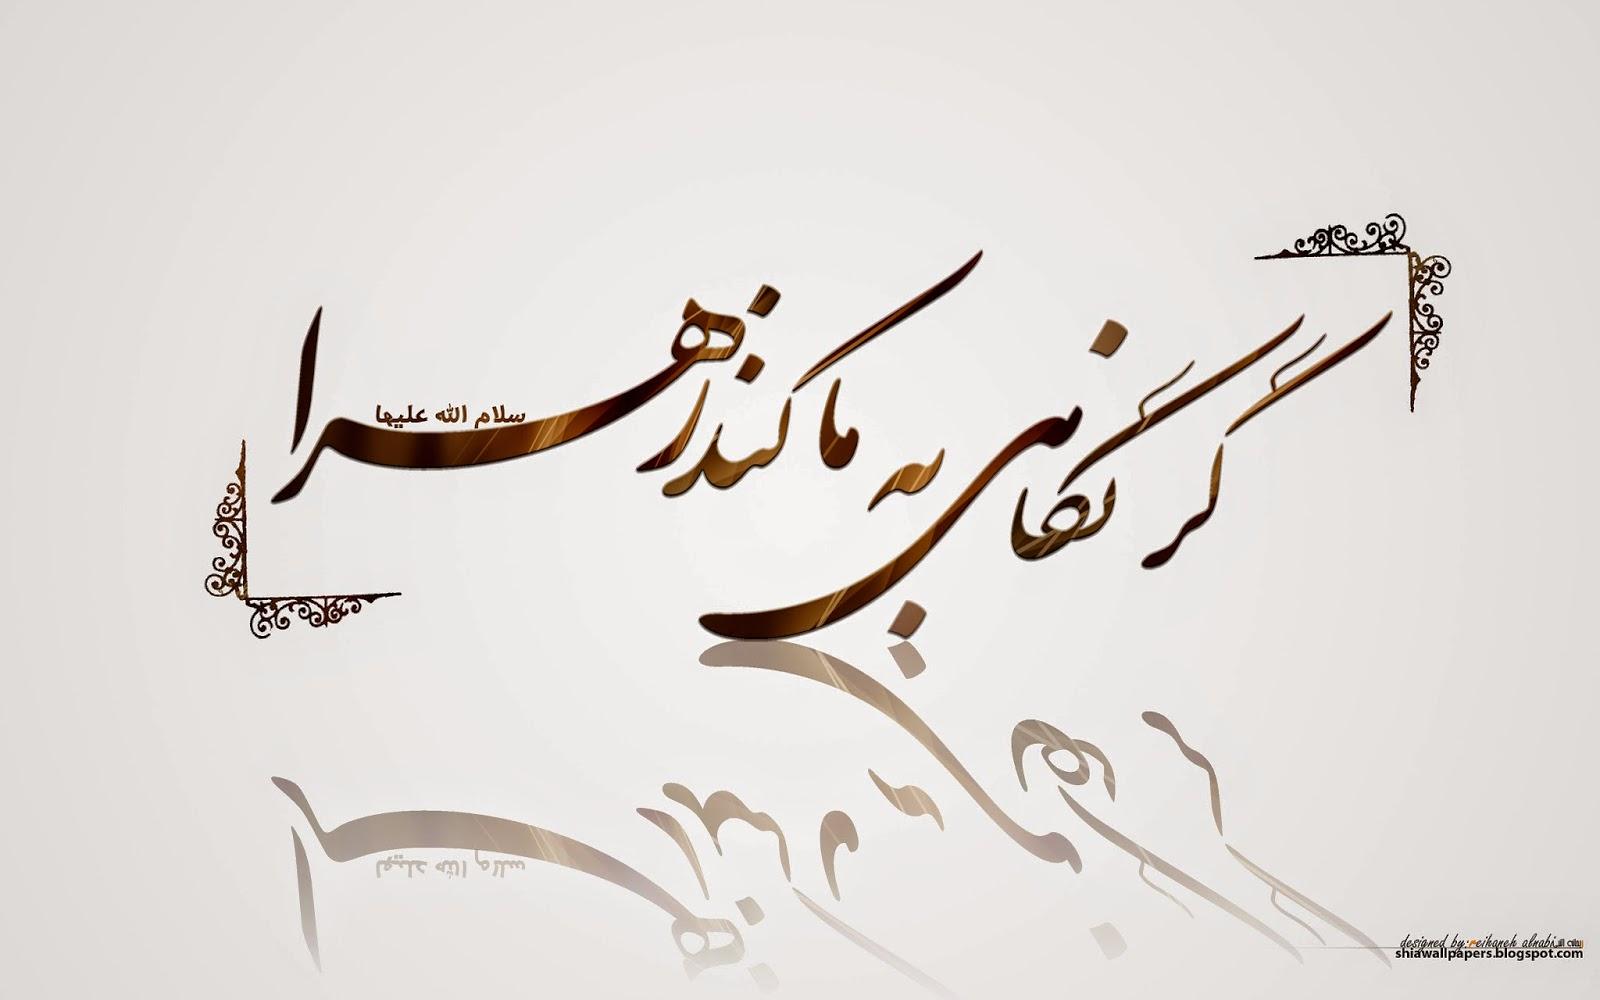 شعر حضرت فاطمه سلام الله  احساس میکنیم که دو عالم گدای ماست